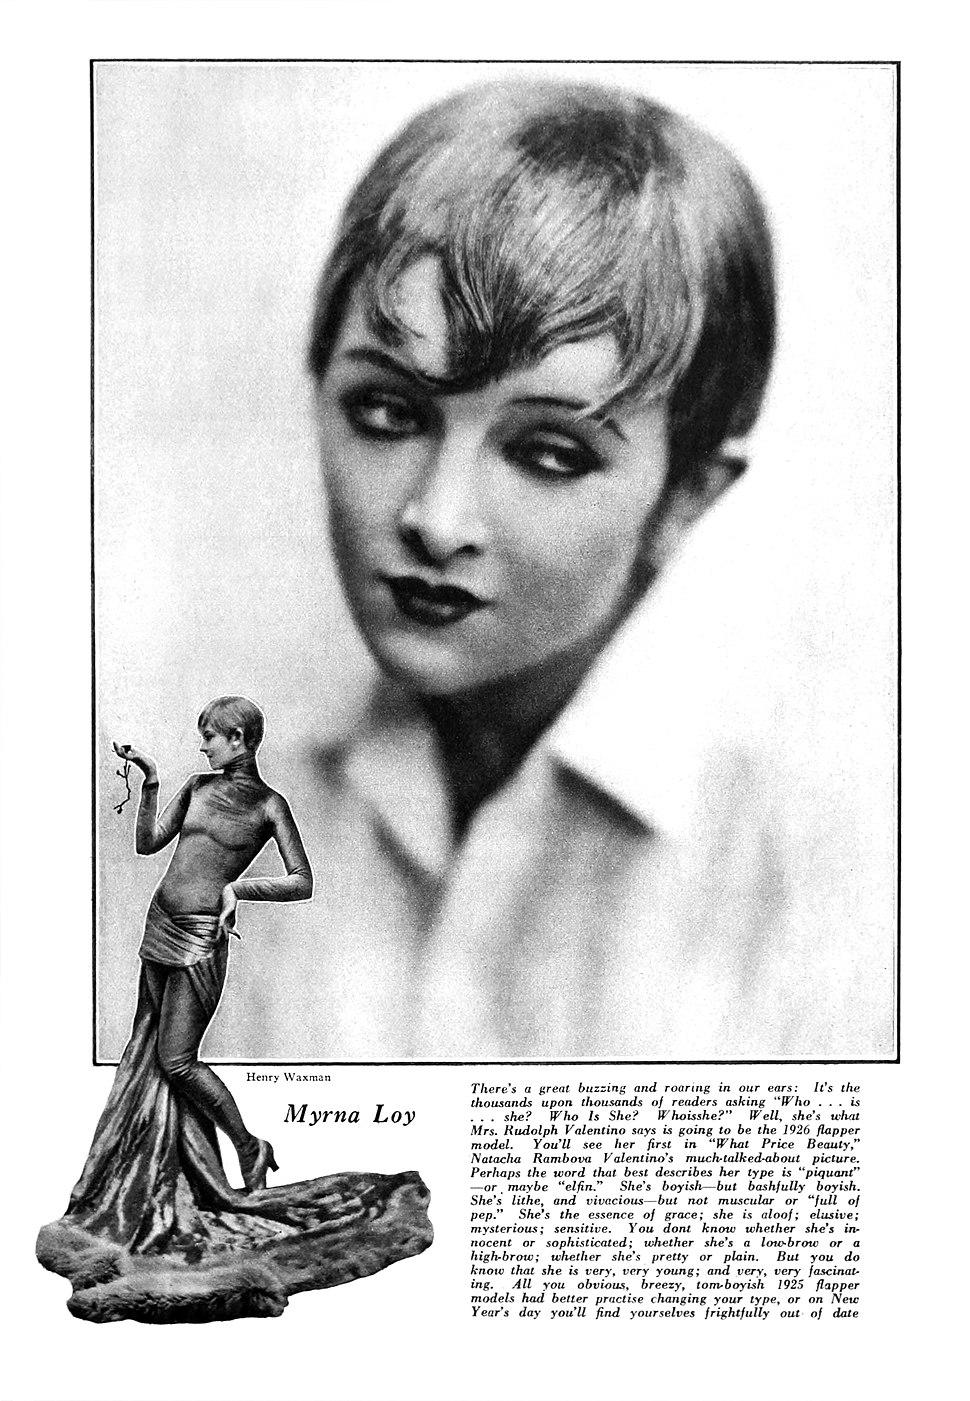 Myrna-Loy-1925